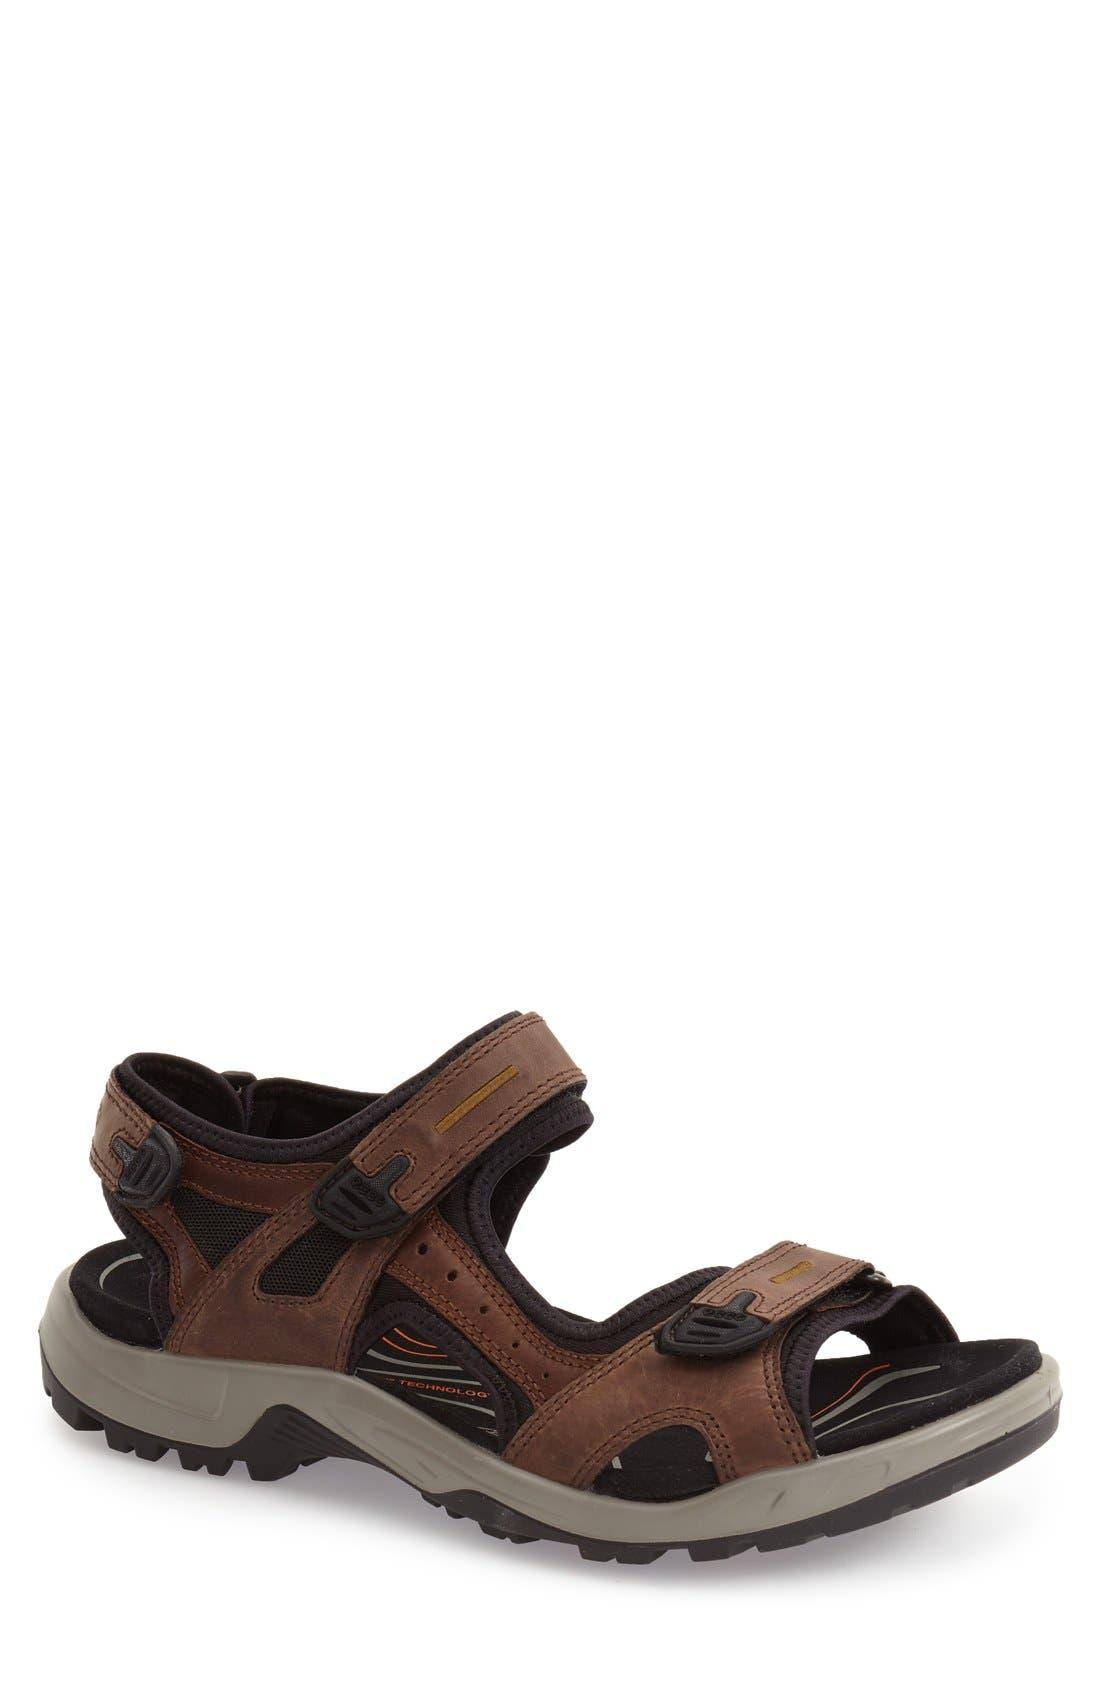 ecco shoes nordstrom rack